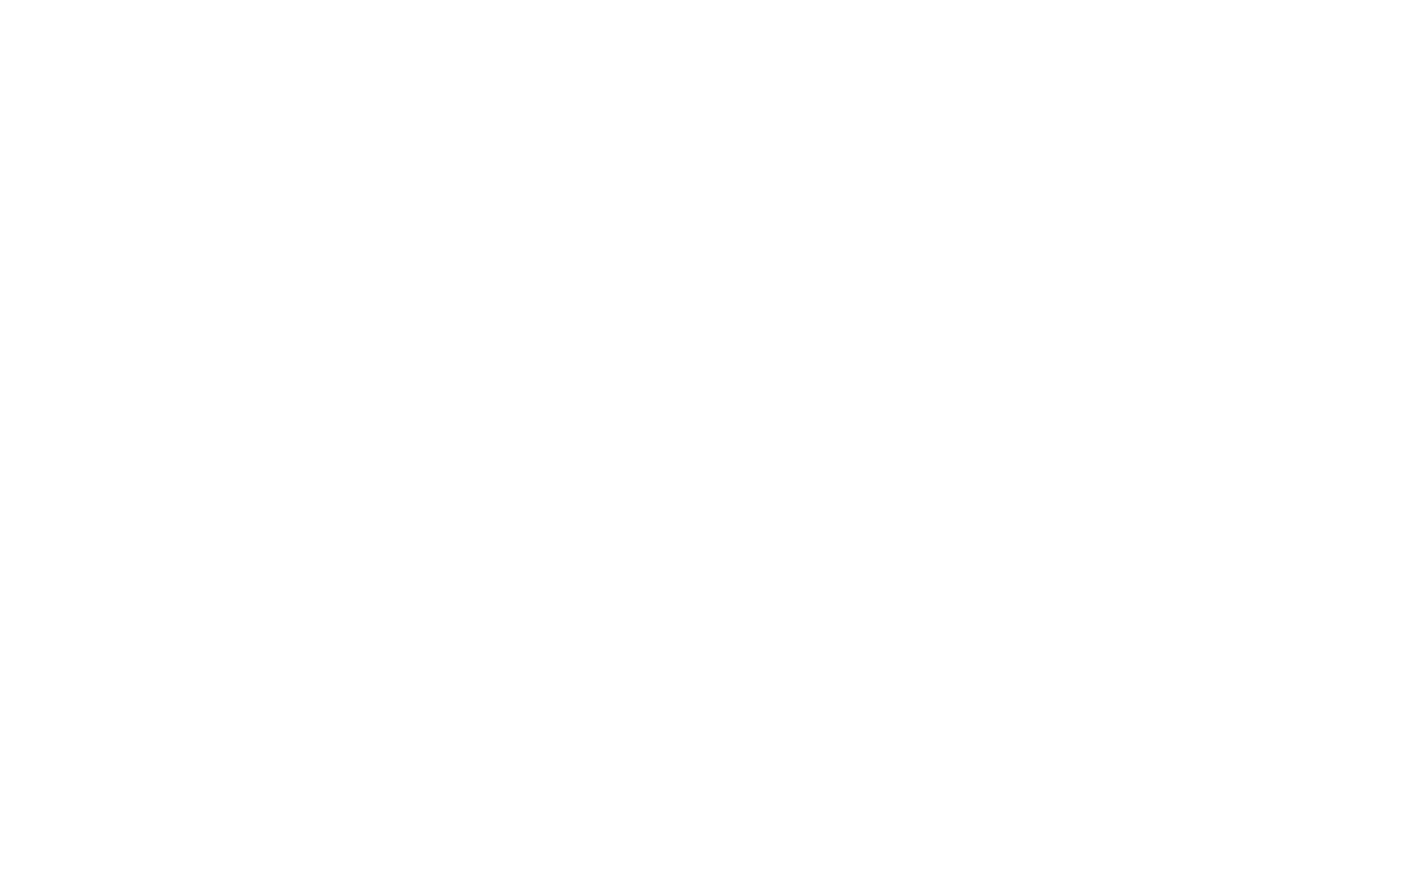 Tedd Wood Cabinetry